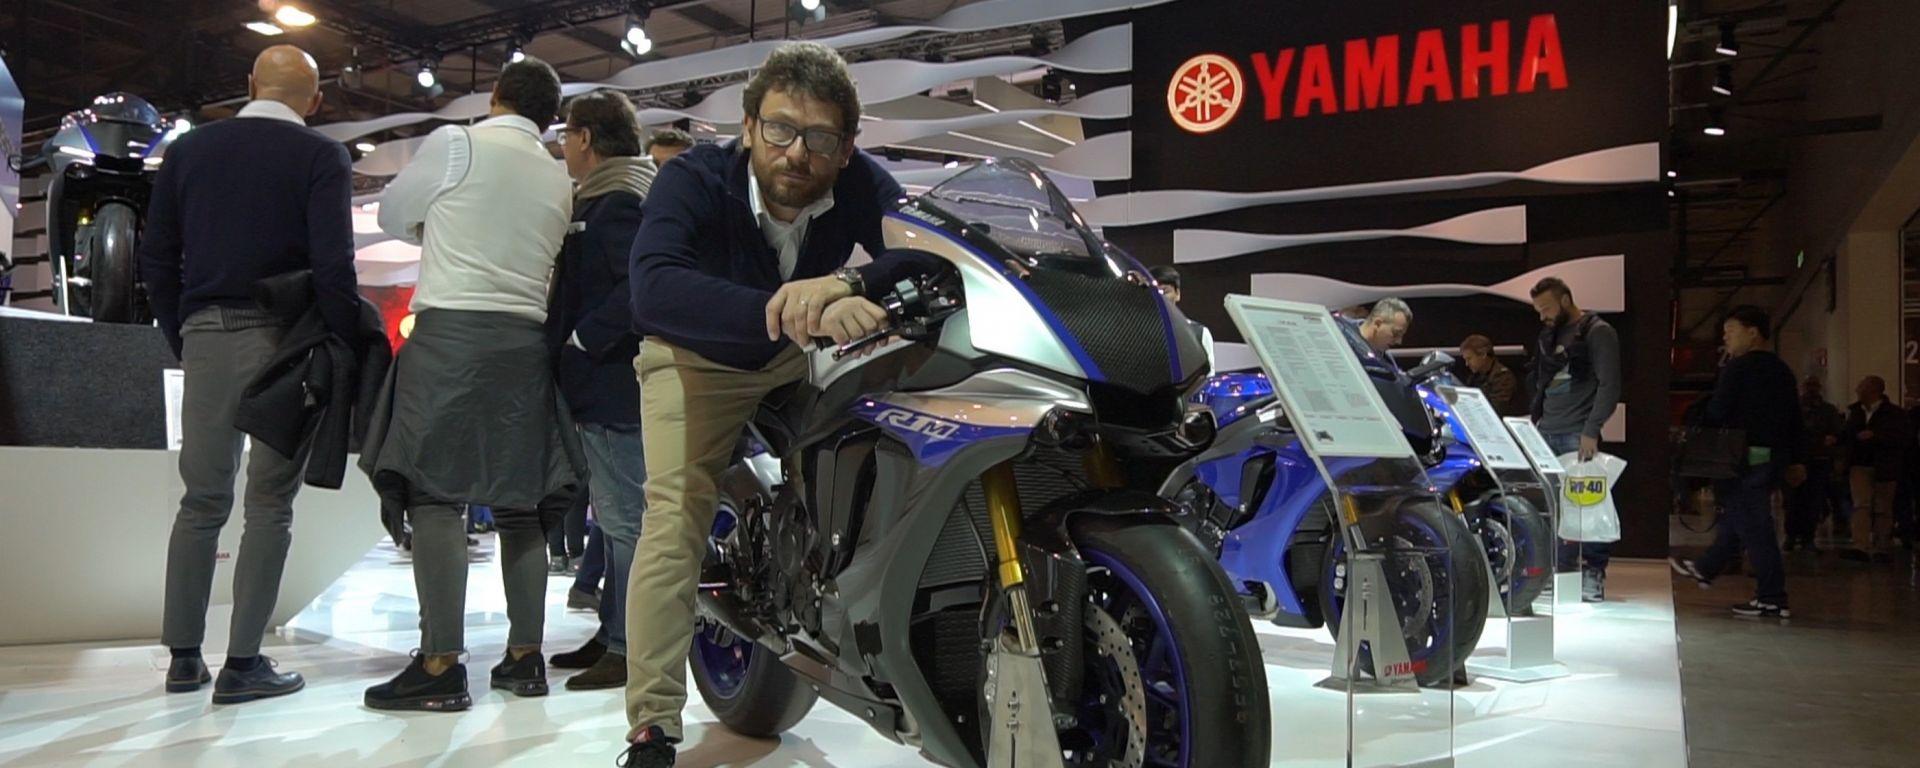 Eicma 2017: nuova elettronica per la Yamaha YZF-R1M MY 2018 [VIDEO]